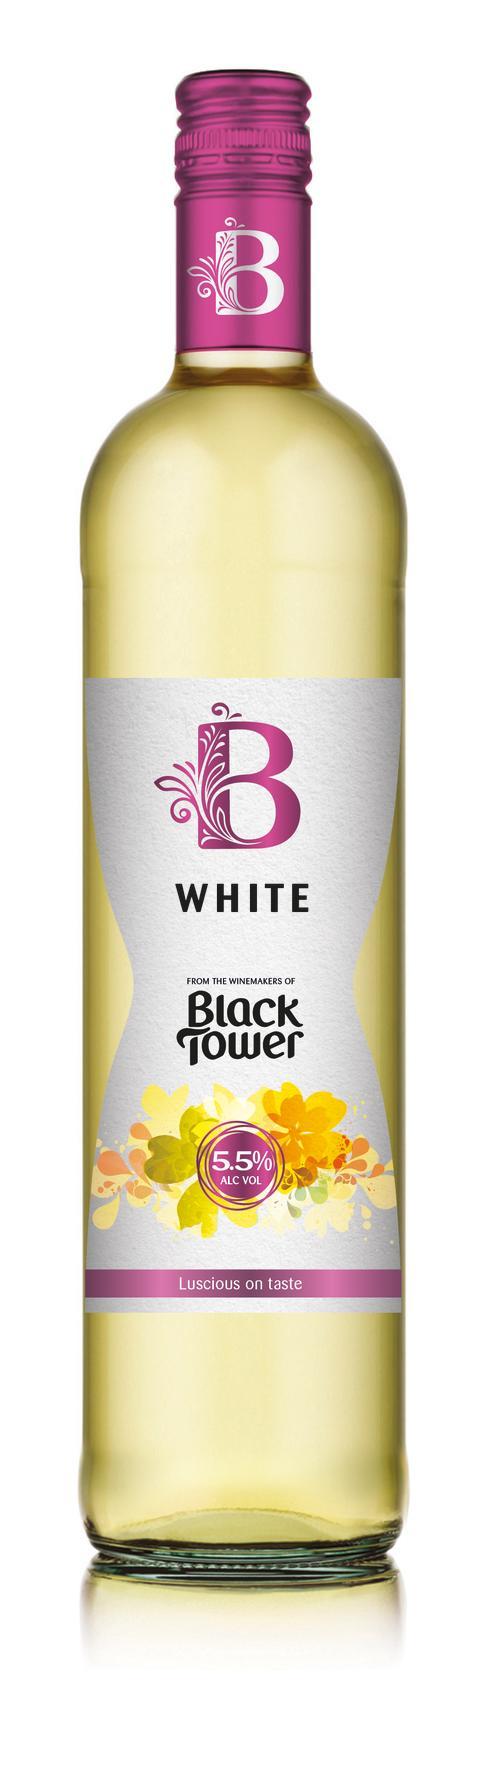 B som i blommigt ungdomlig,  B som i B by Black Tower